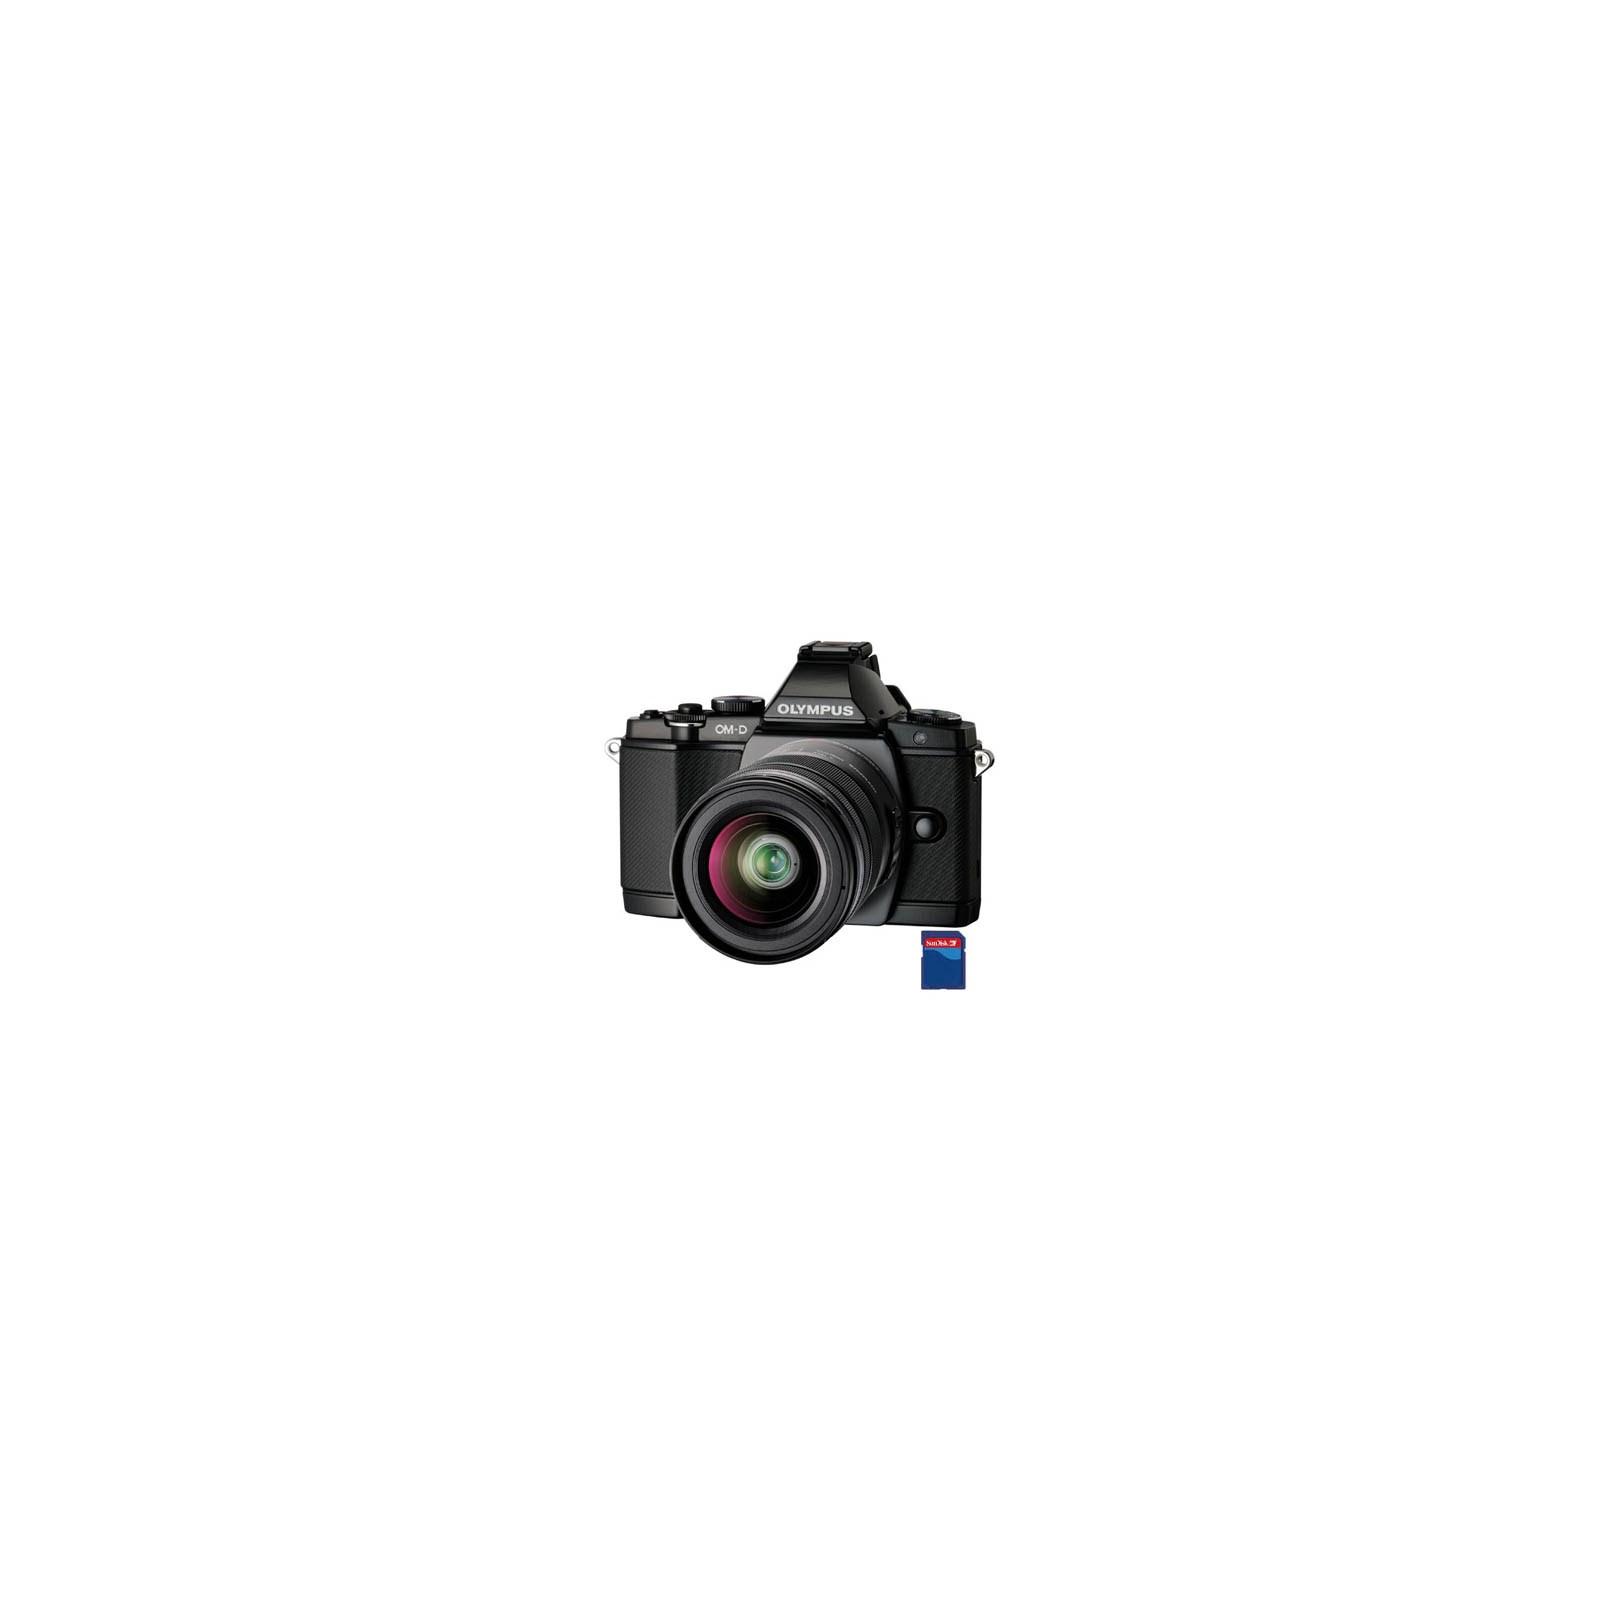 Цифровой фотоаппарат OLYMPUS OM-D E-M5 12-50 kit black/black (V204045BE000)